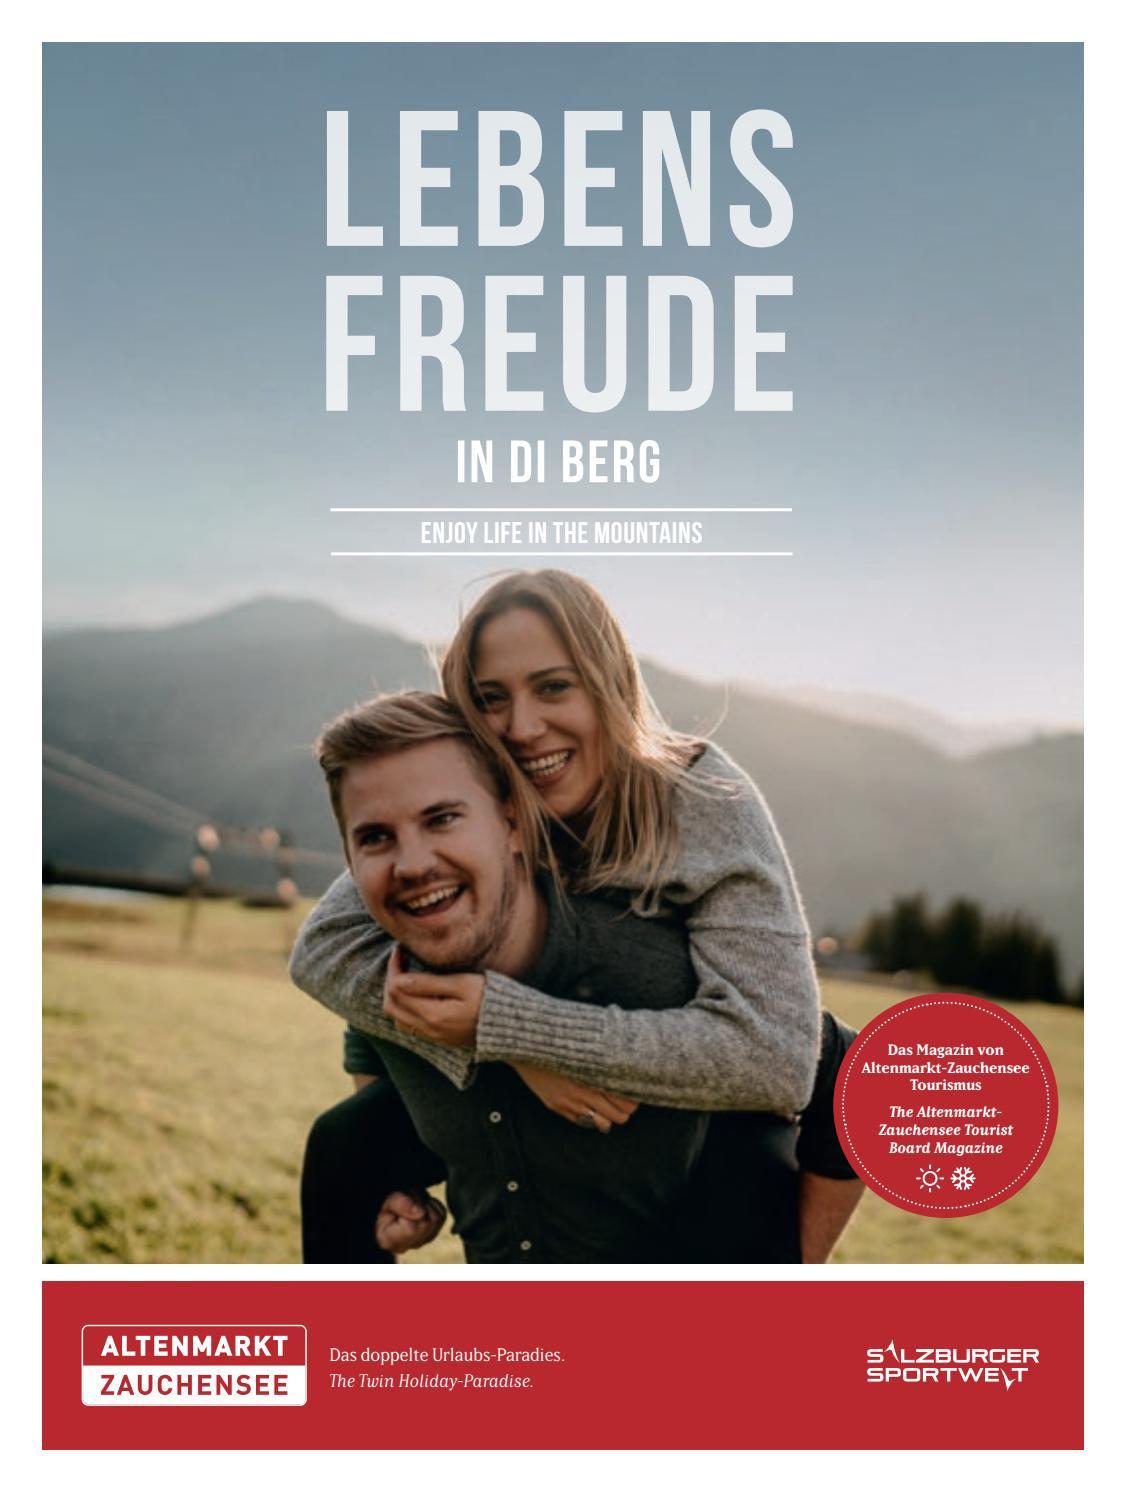 Gamlitz dating app. Datingseite in groebersdorf